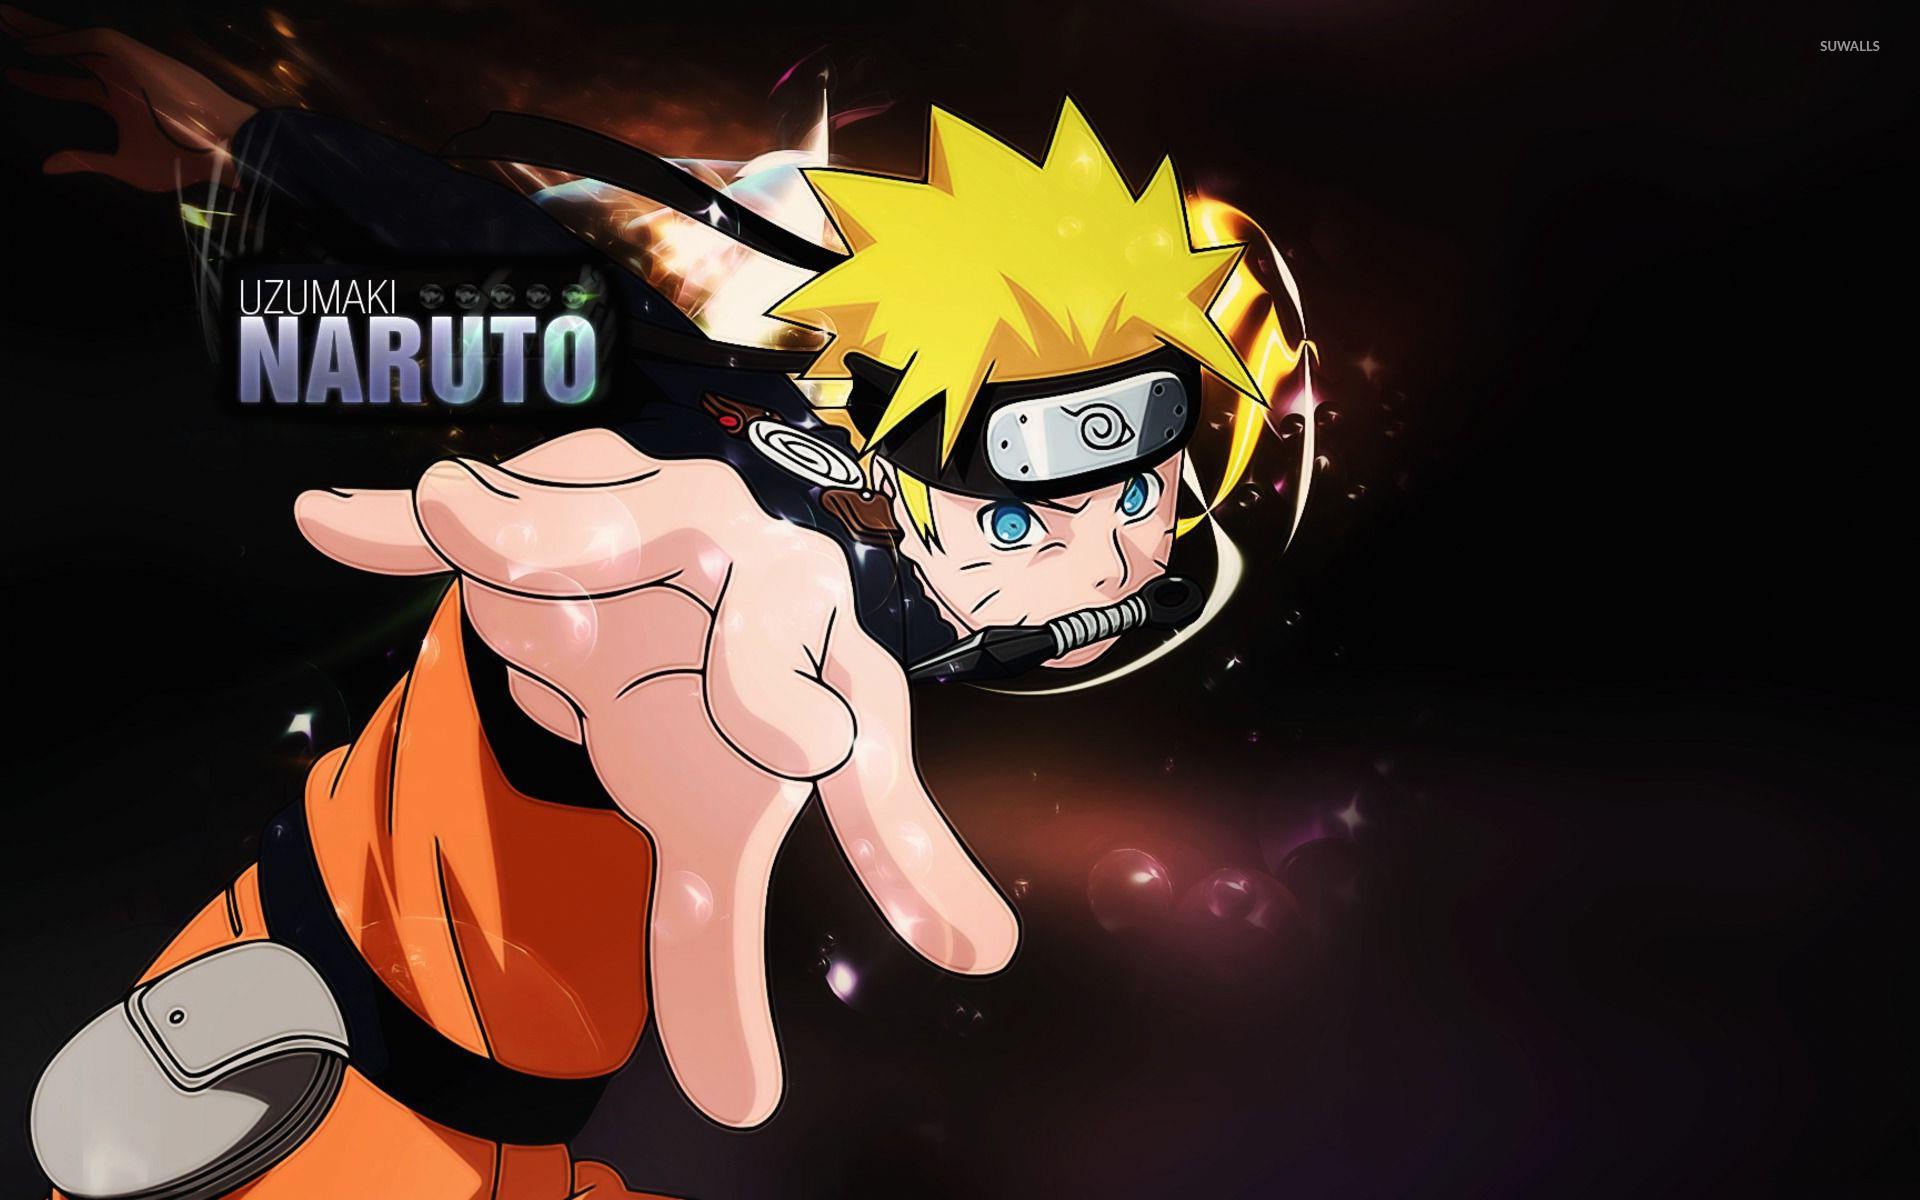 Naruto Uzumaki wallpaper   Anime wallpapers   13629 1366x768